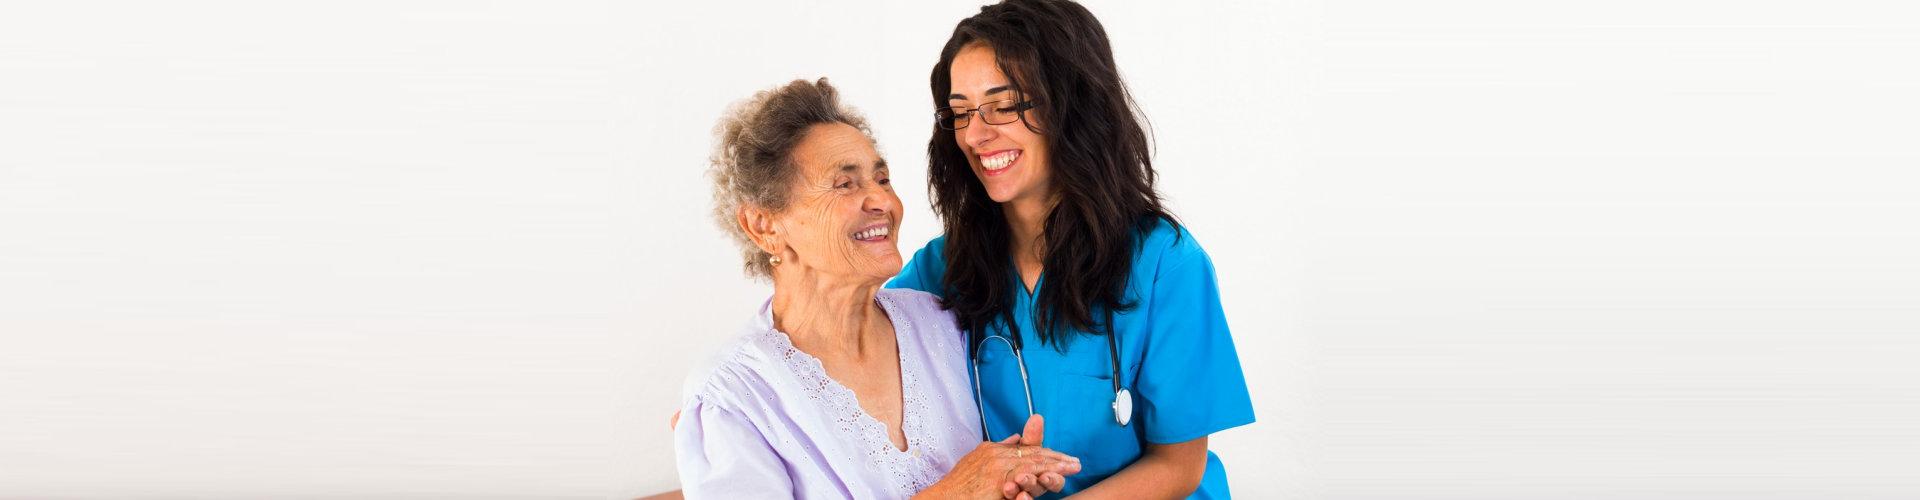 nurse and caregiver are smiling